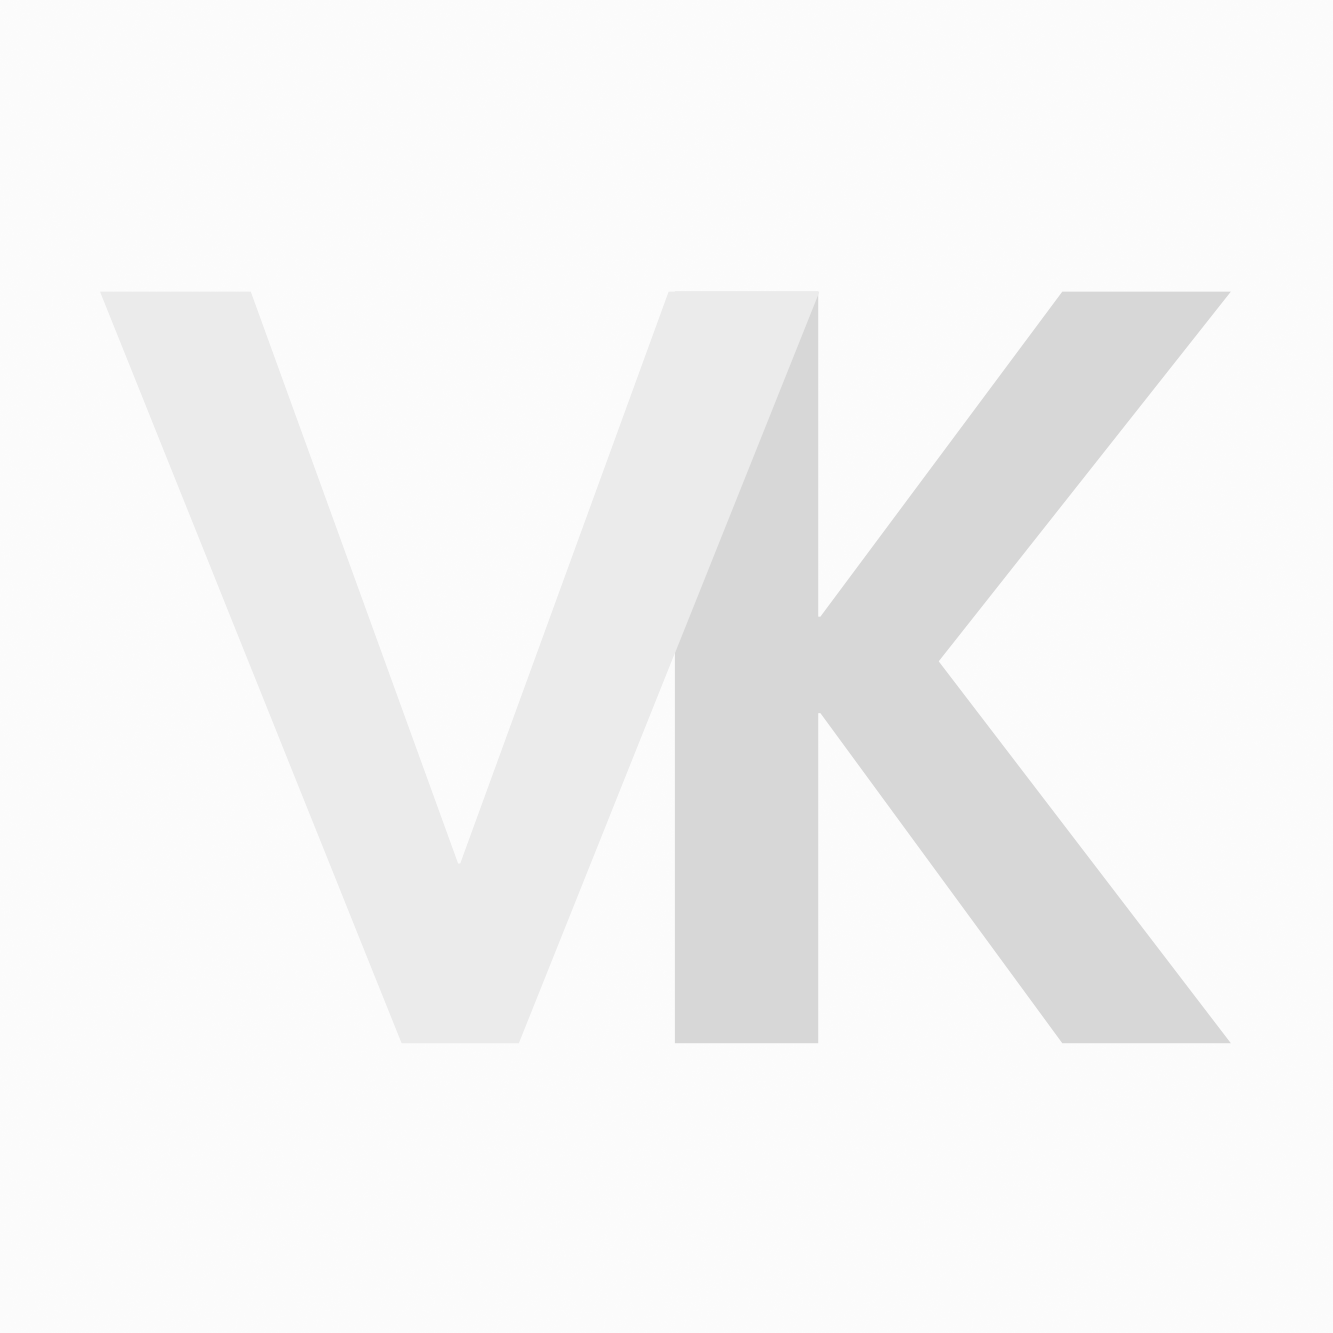 Sibel Kaplaken Dots Black 108x130cm